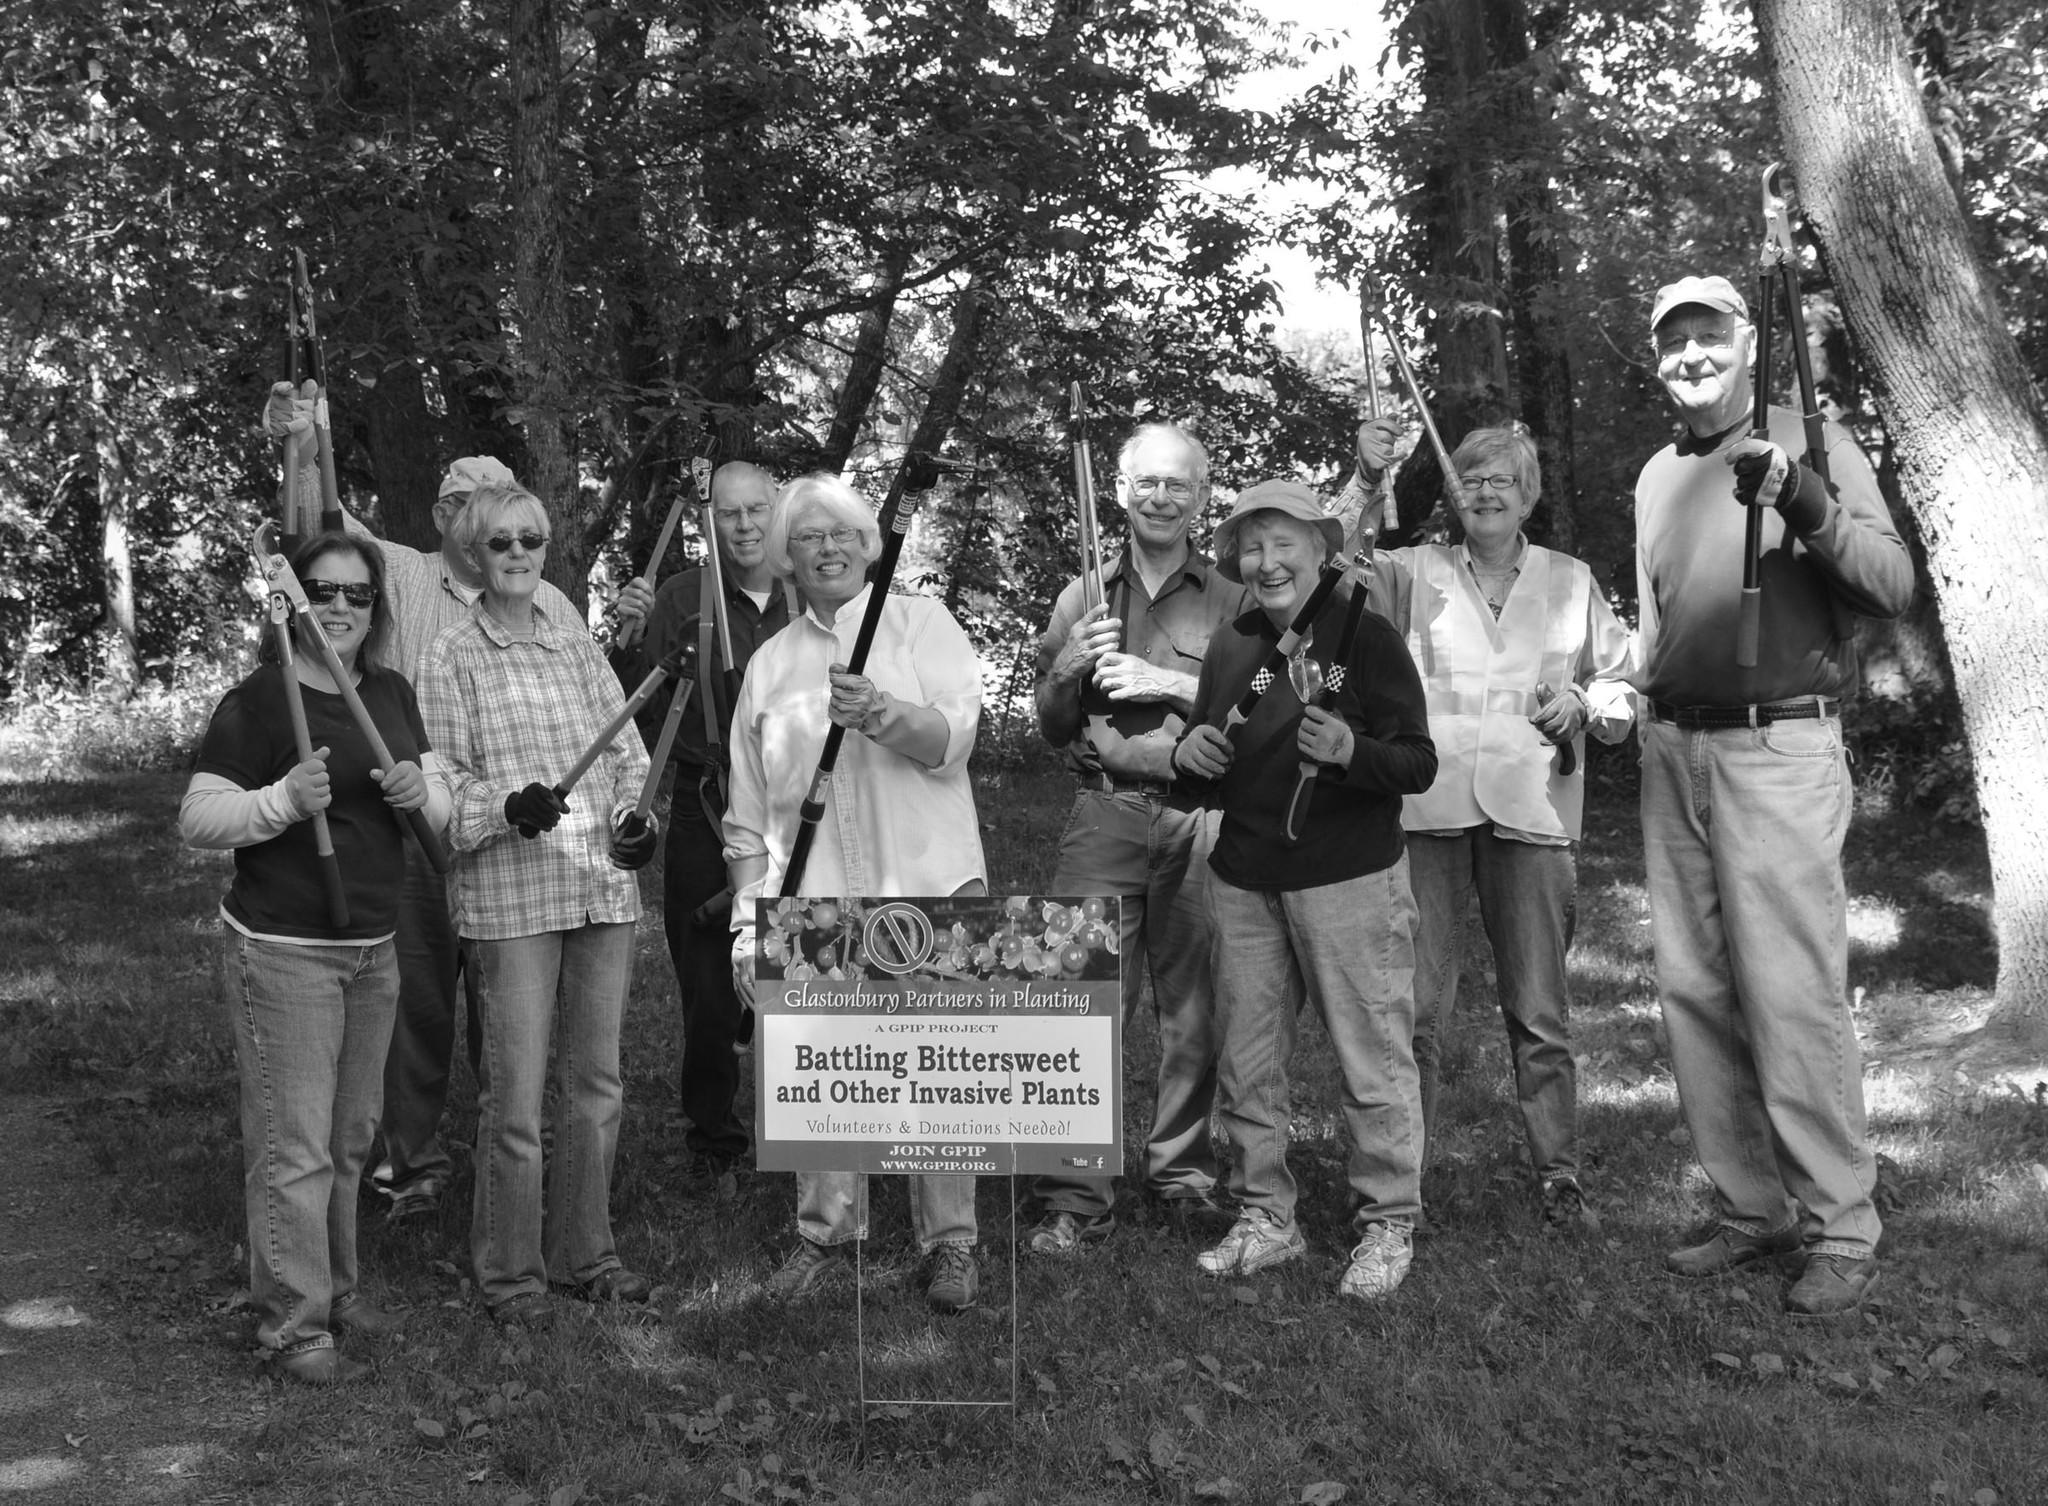 Front row (L-R): Pam Eudow, Evelyn Eisenhardt, Ann Pettengill, Lynn Butcher. Back row (L-R): Mike Pettengill, Bruce Lester, Alan Spier, Jan Edmondson, Dick Gagnon